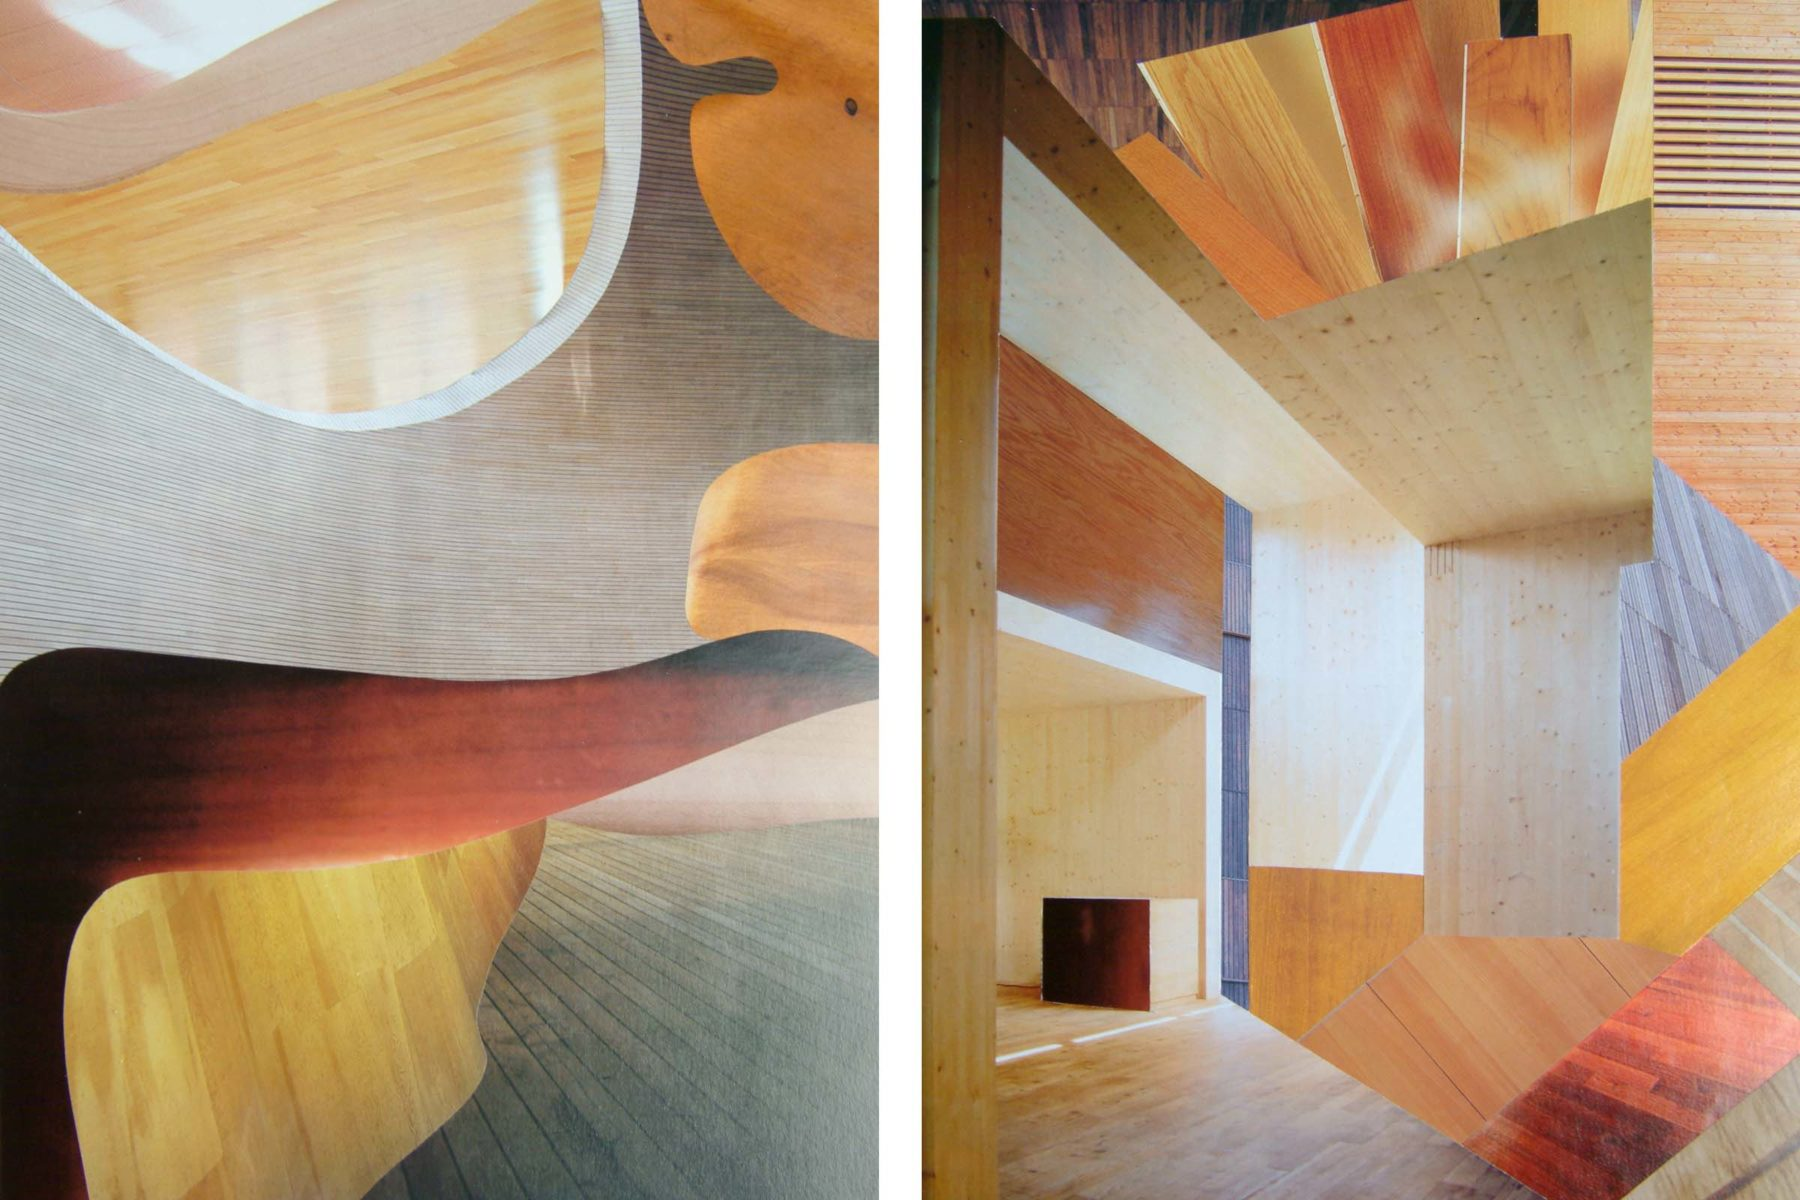 Devis Venturelli, Eidotipo (L47, L102), 2012, collage on paper, 30 x 20 cm each